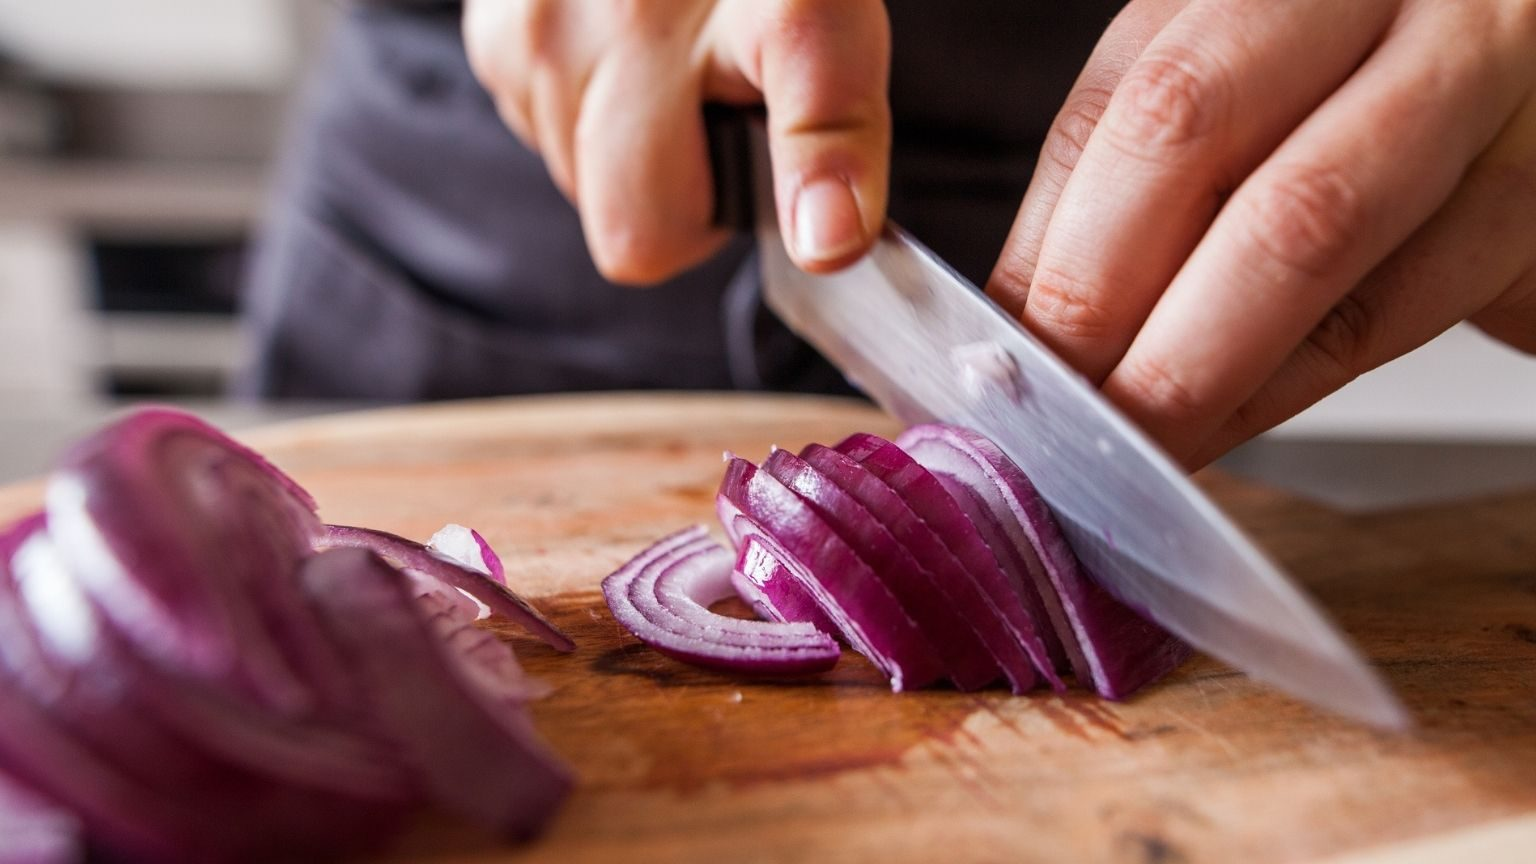 Chef using kitchen knives